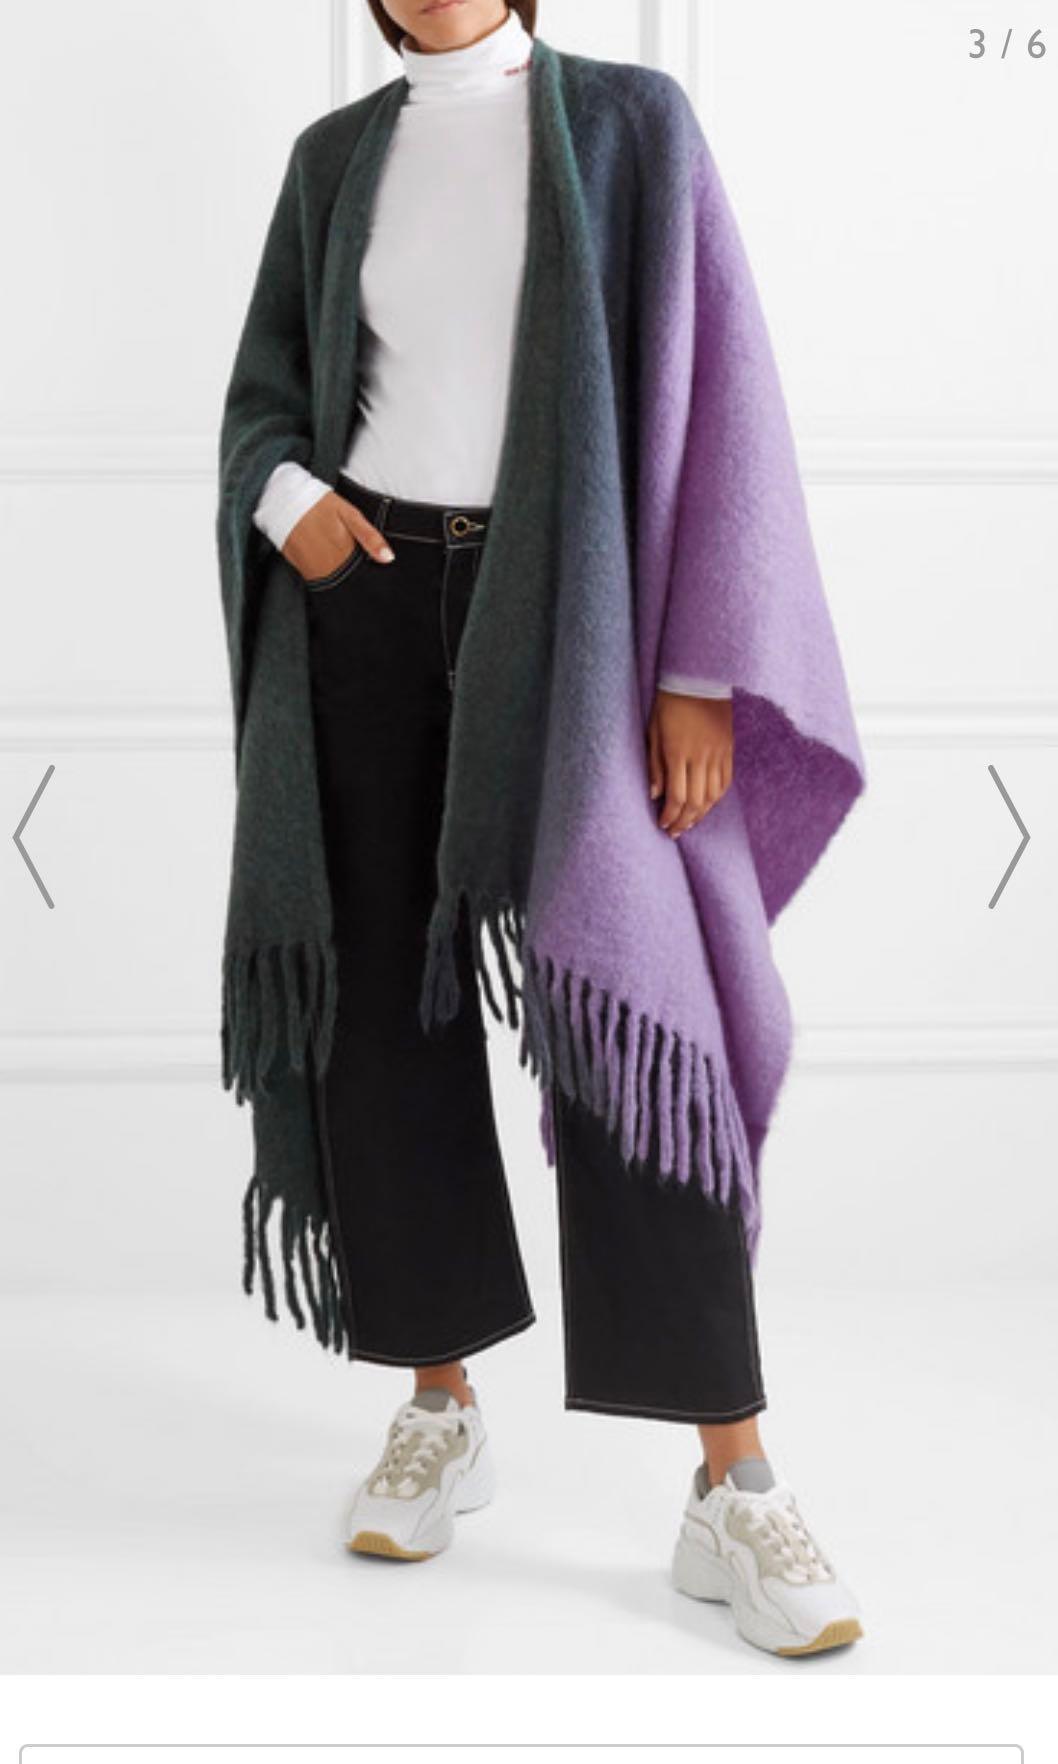 [Sale]全新正貨Acne Studios Poncho scarf披肩 頸巾